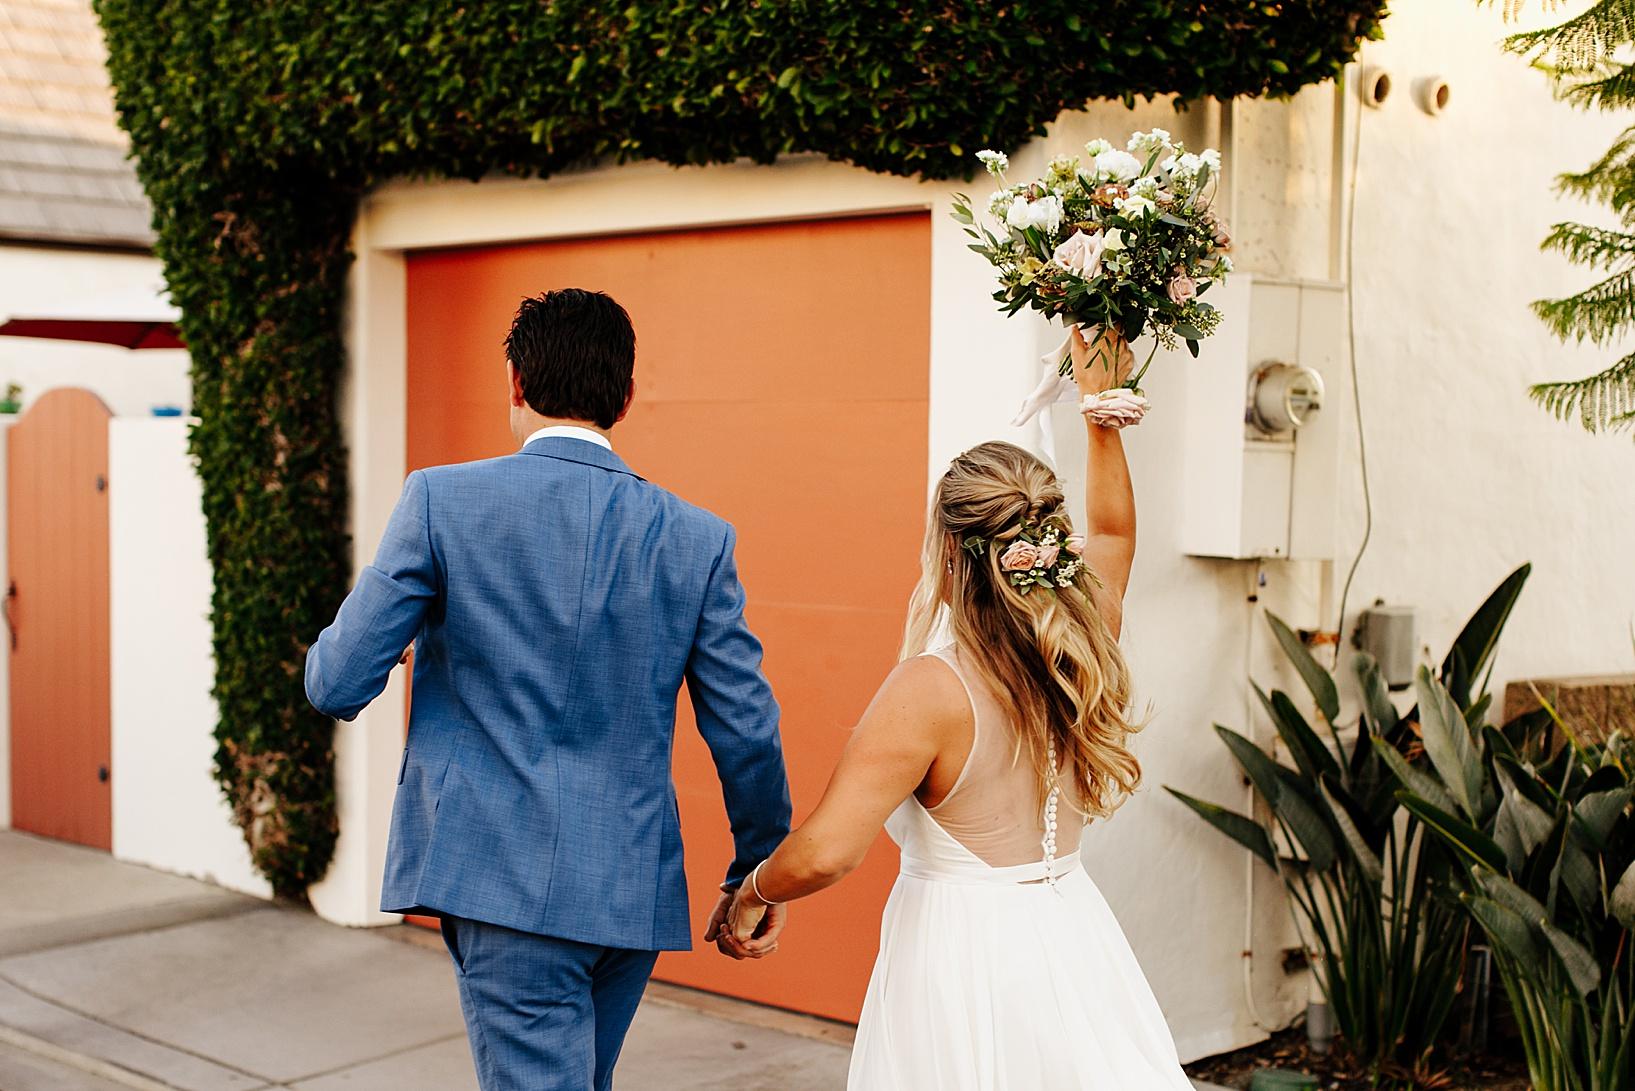 sunset photos for La Jolla, Ca wedding at TThe Darlington House